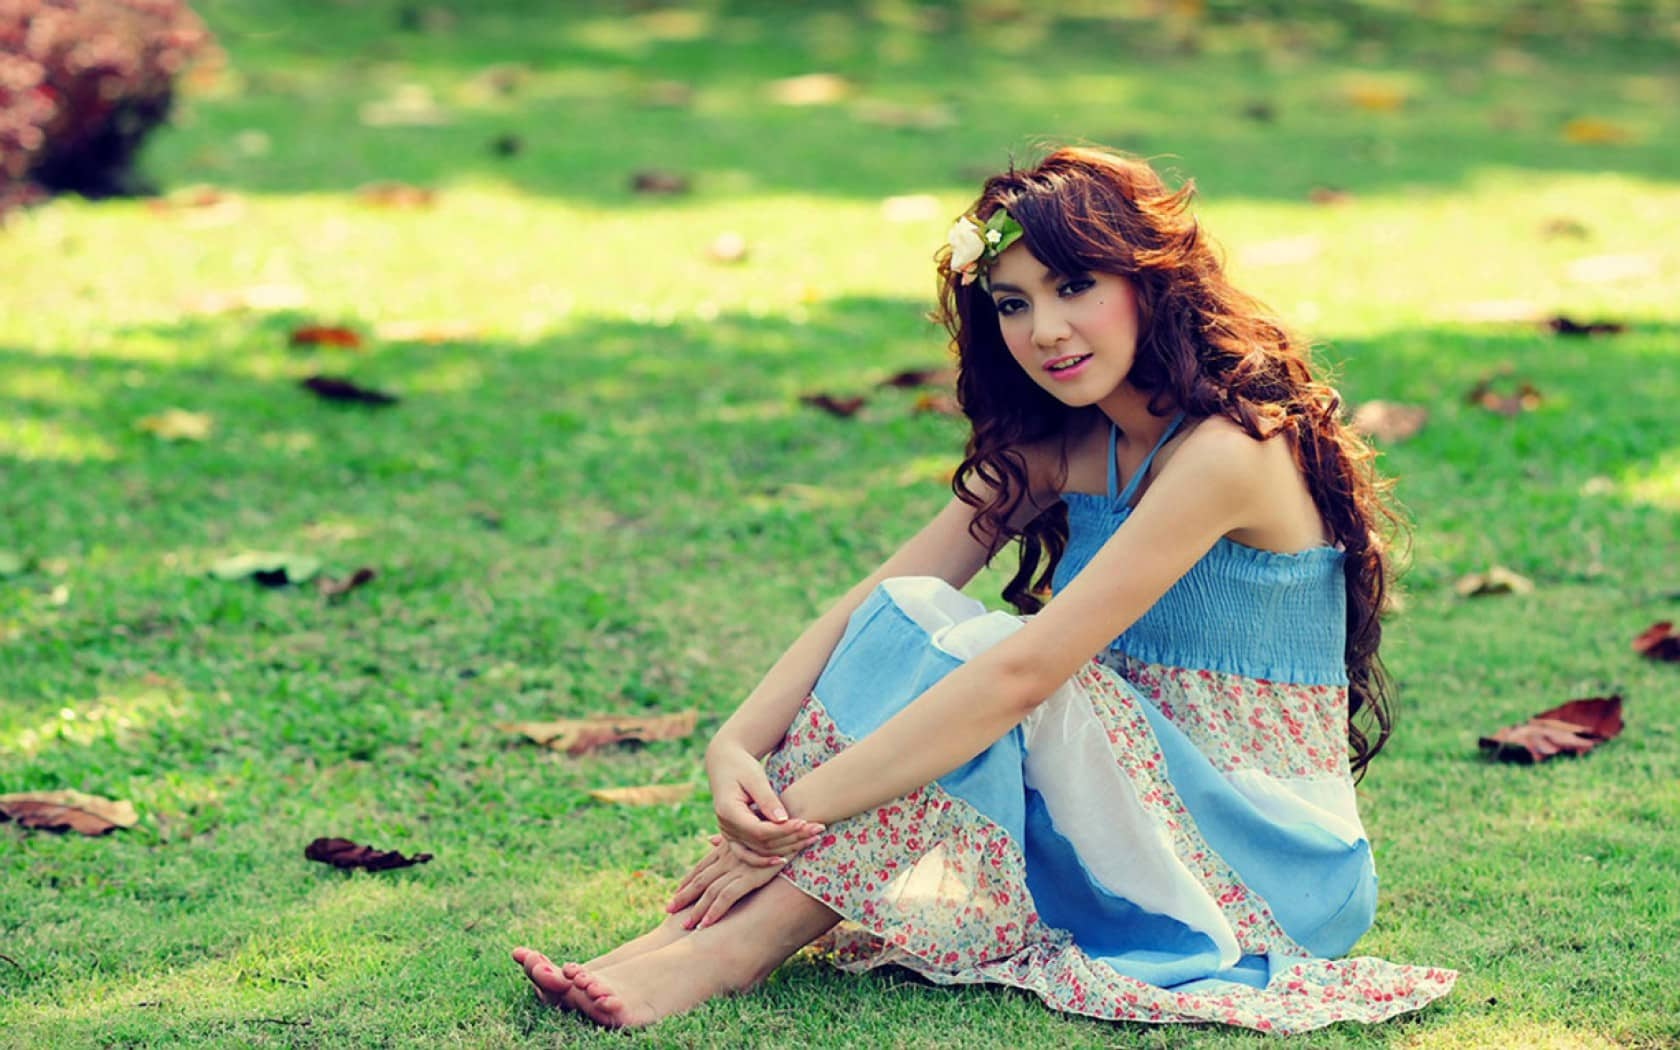 beautiful-girl-sitting-alone-hd-wallpaper